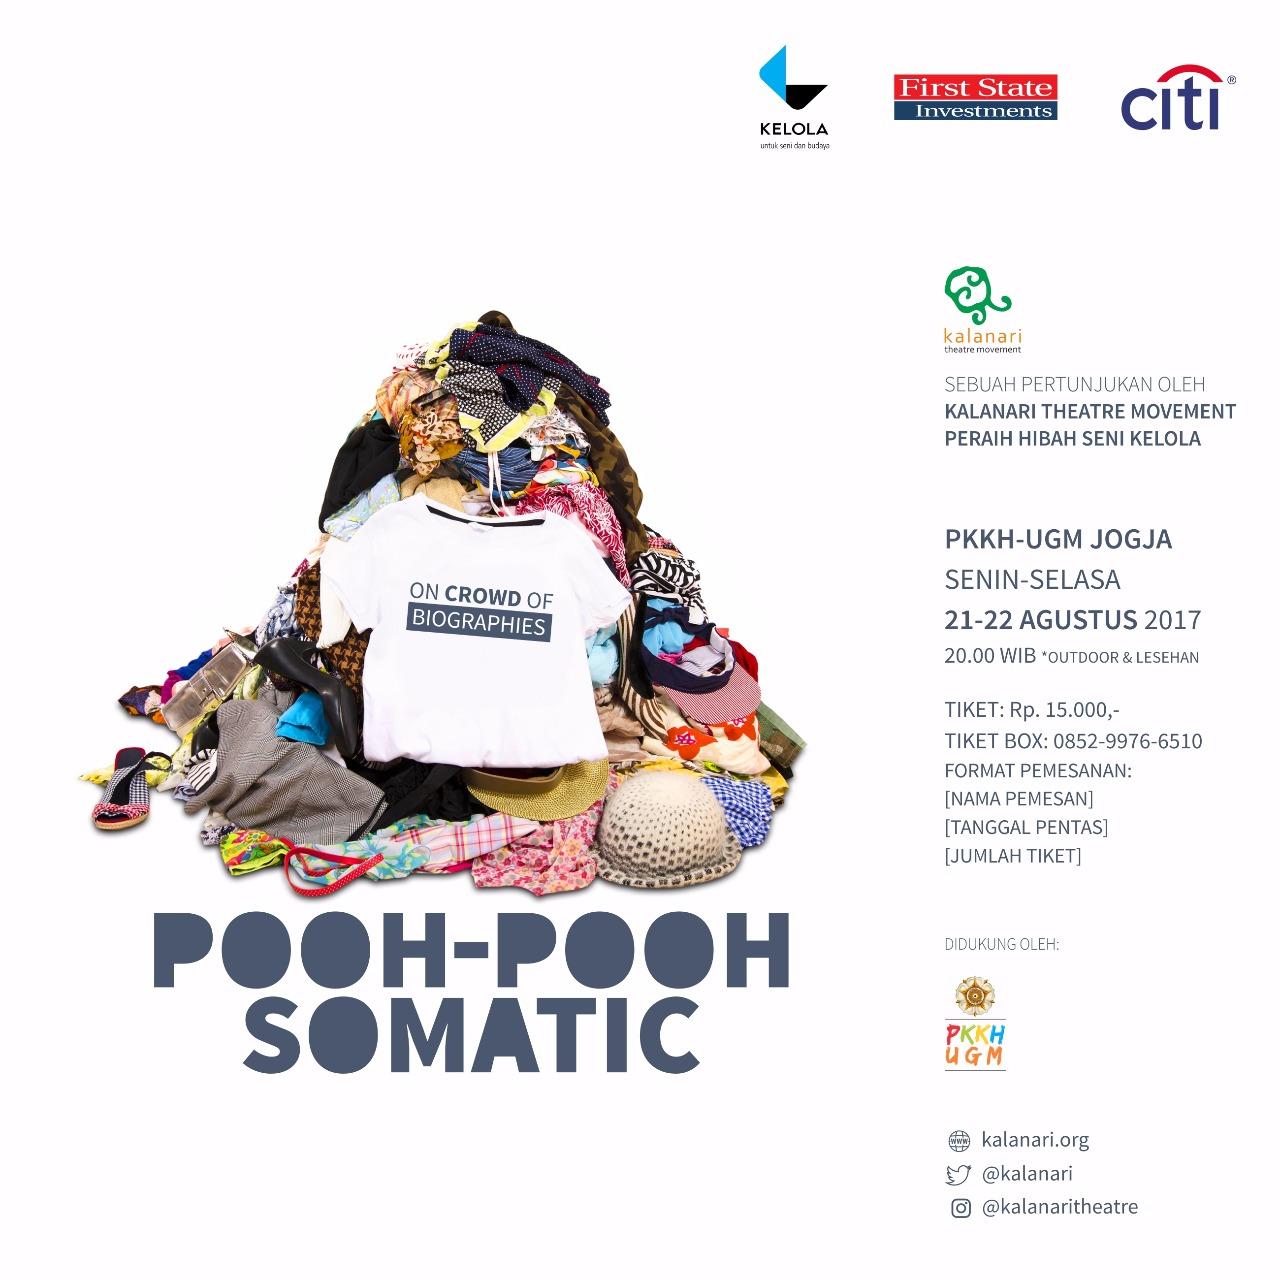 WhatsApp Image 2017 08 10 at 06.37.11 | Teater | Pooh-pooh Somatic : On Crowd of Biographies | Kalanari Teater